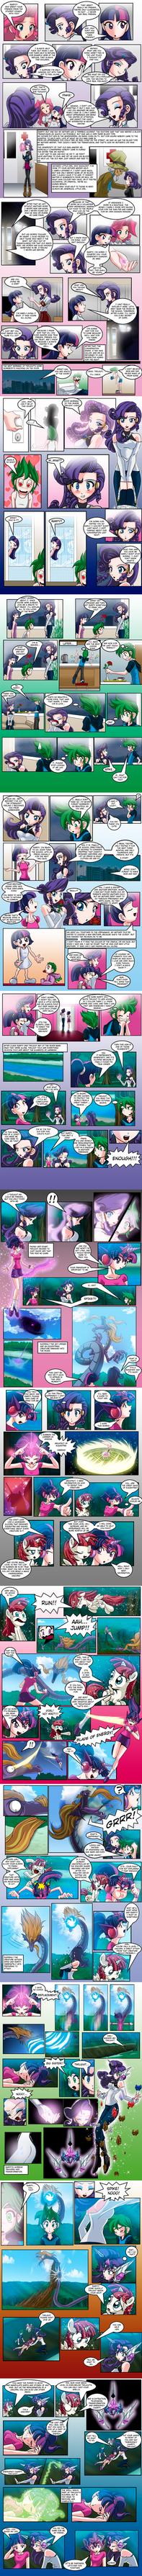 Friendship Is Magic 02:  P2 by mauroz